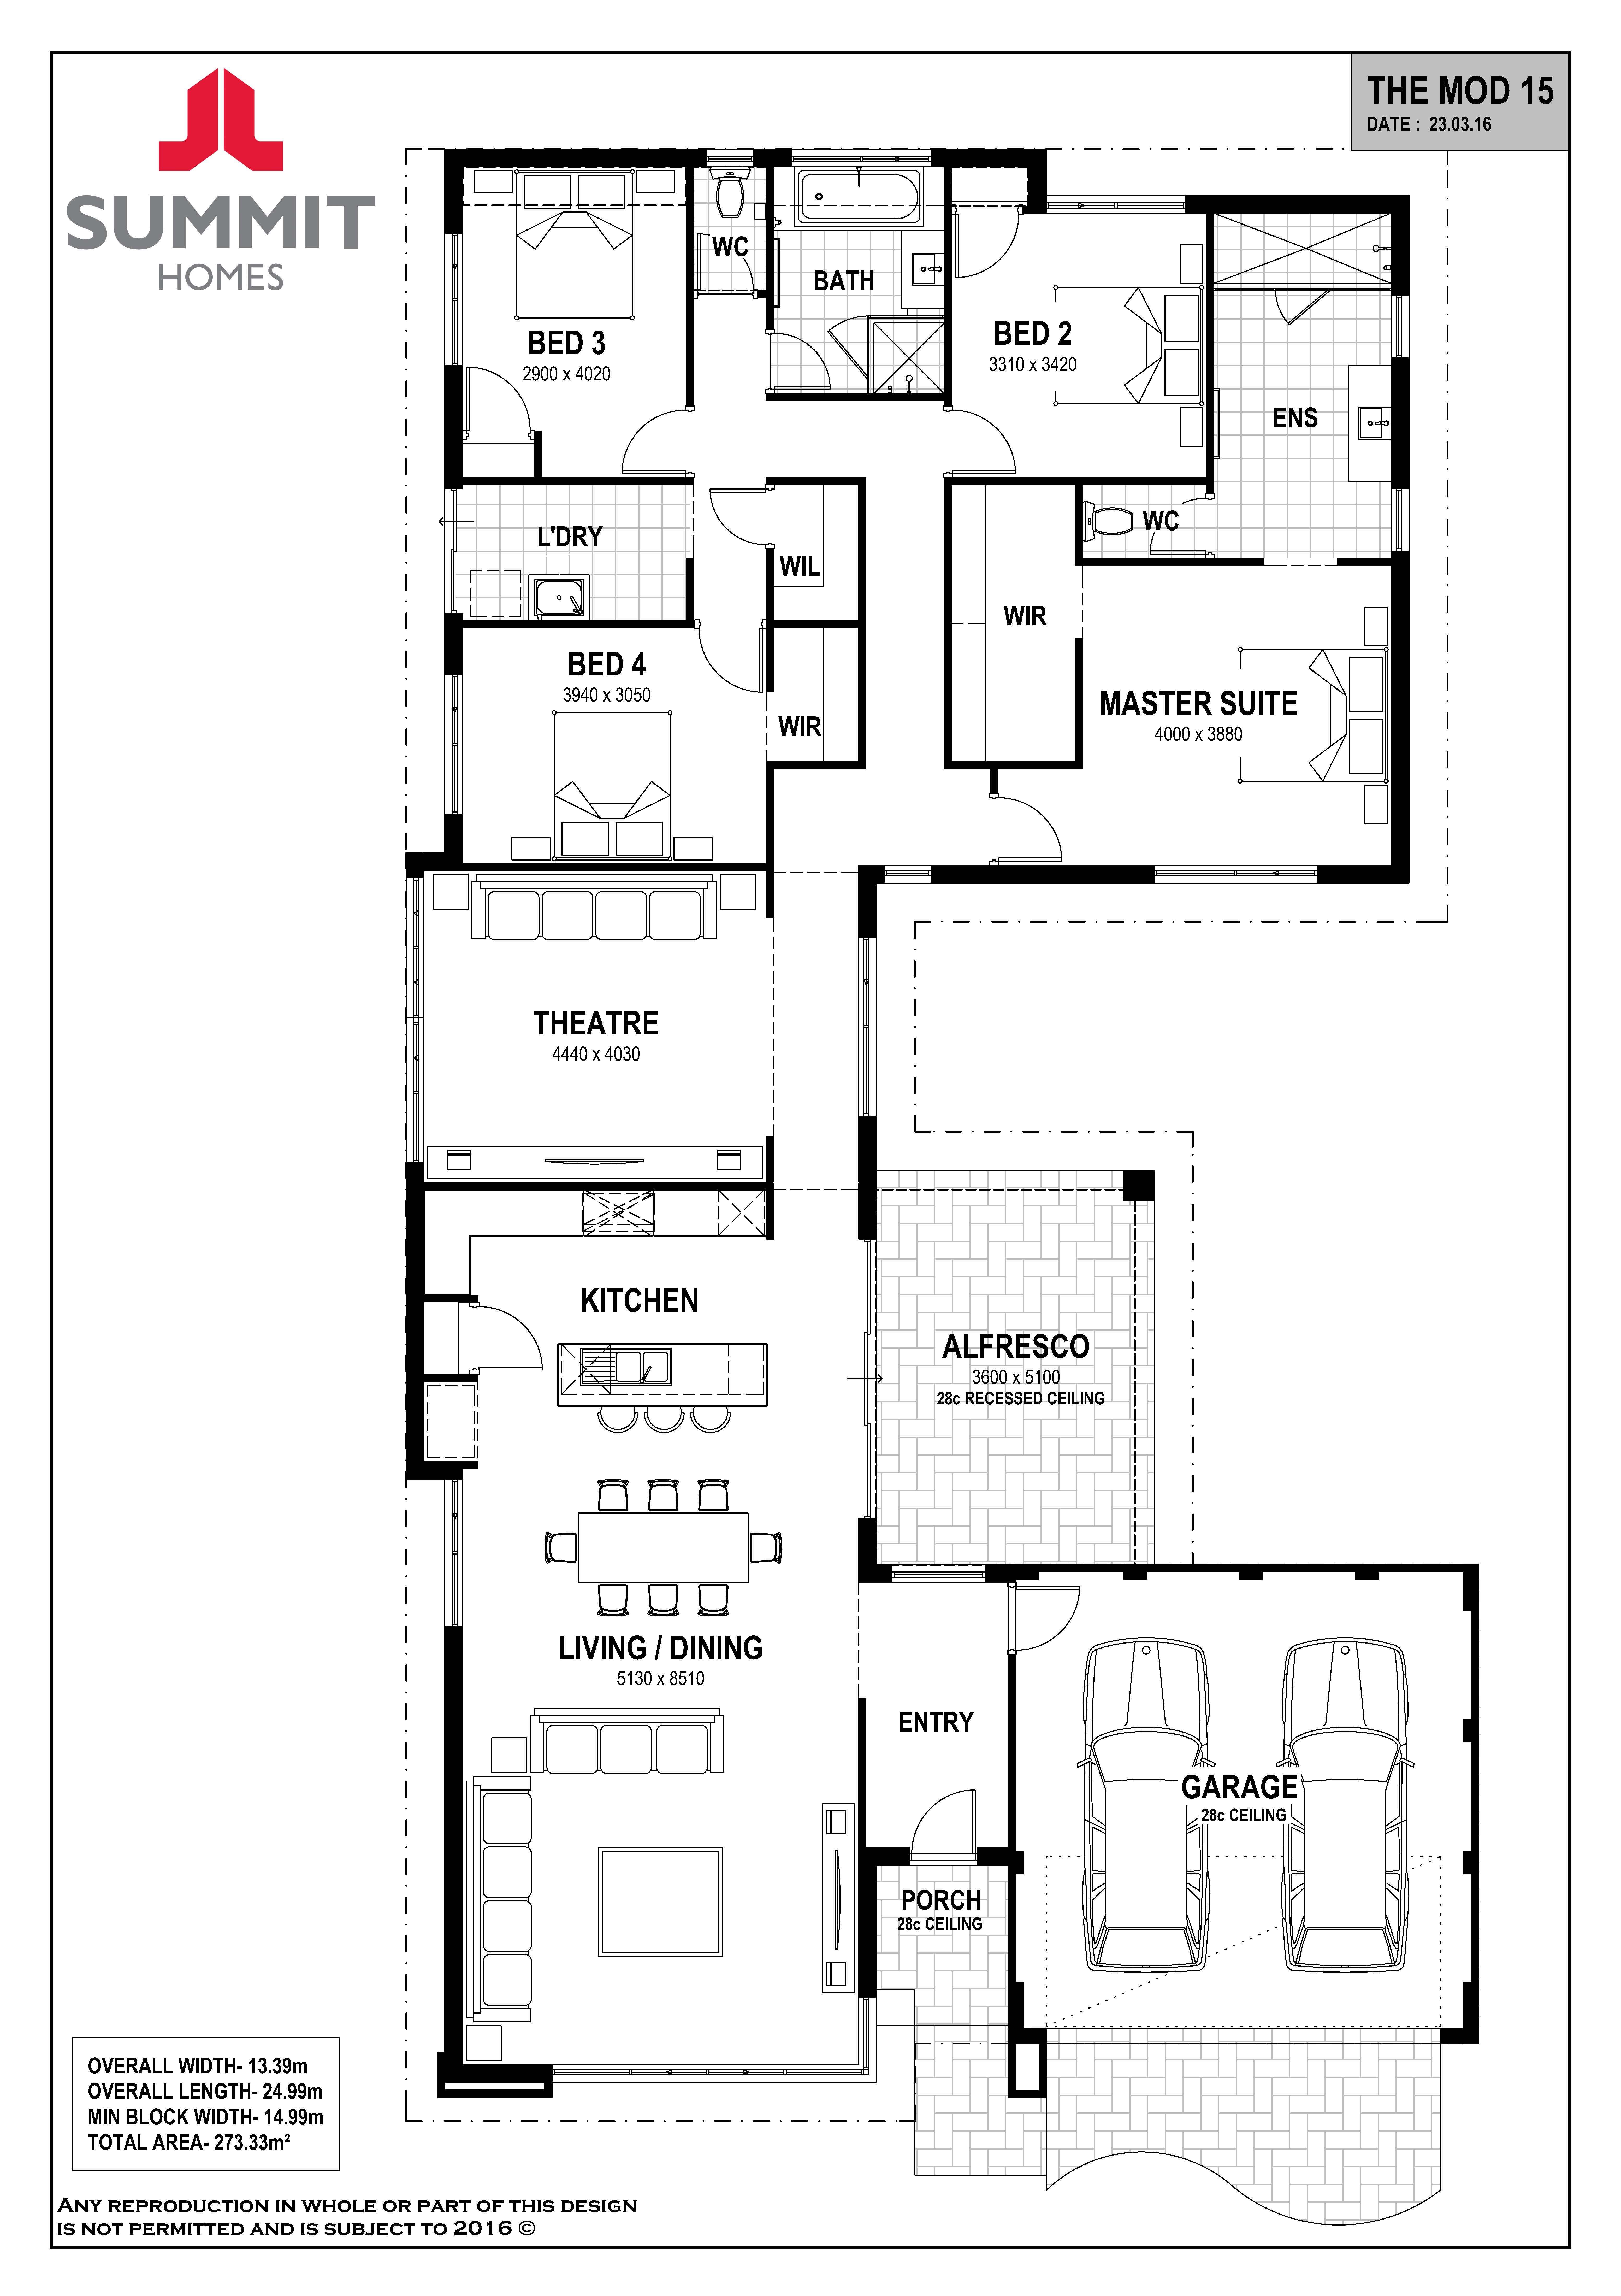 Mod 15 Floorplan